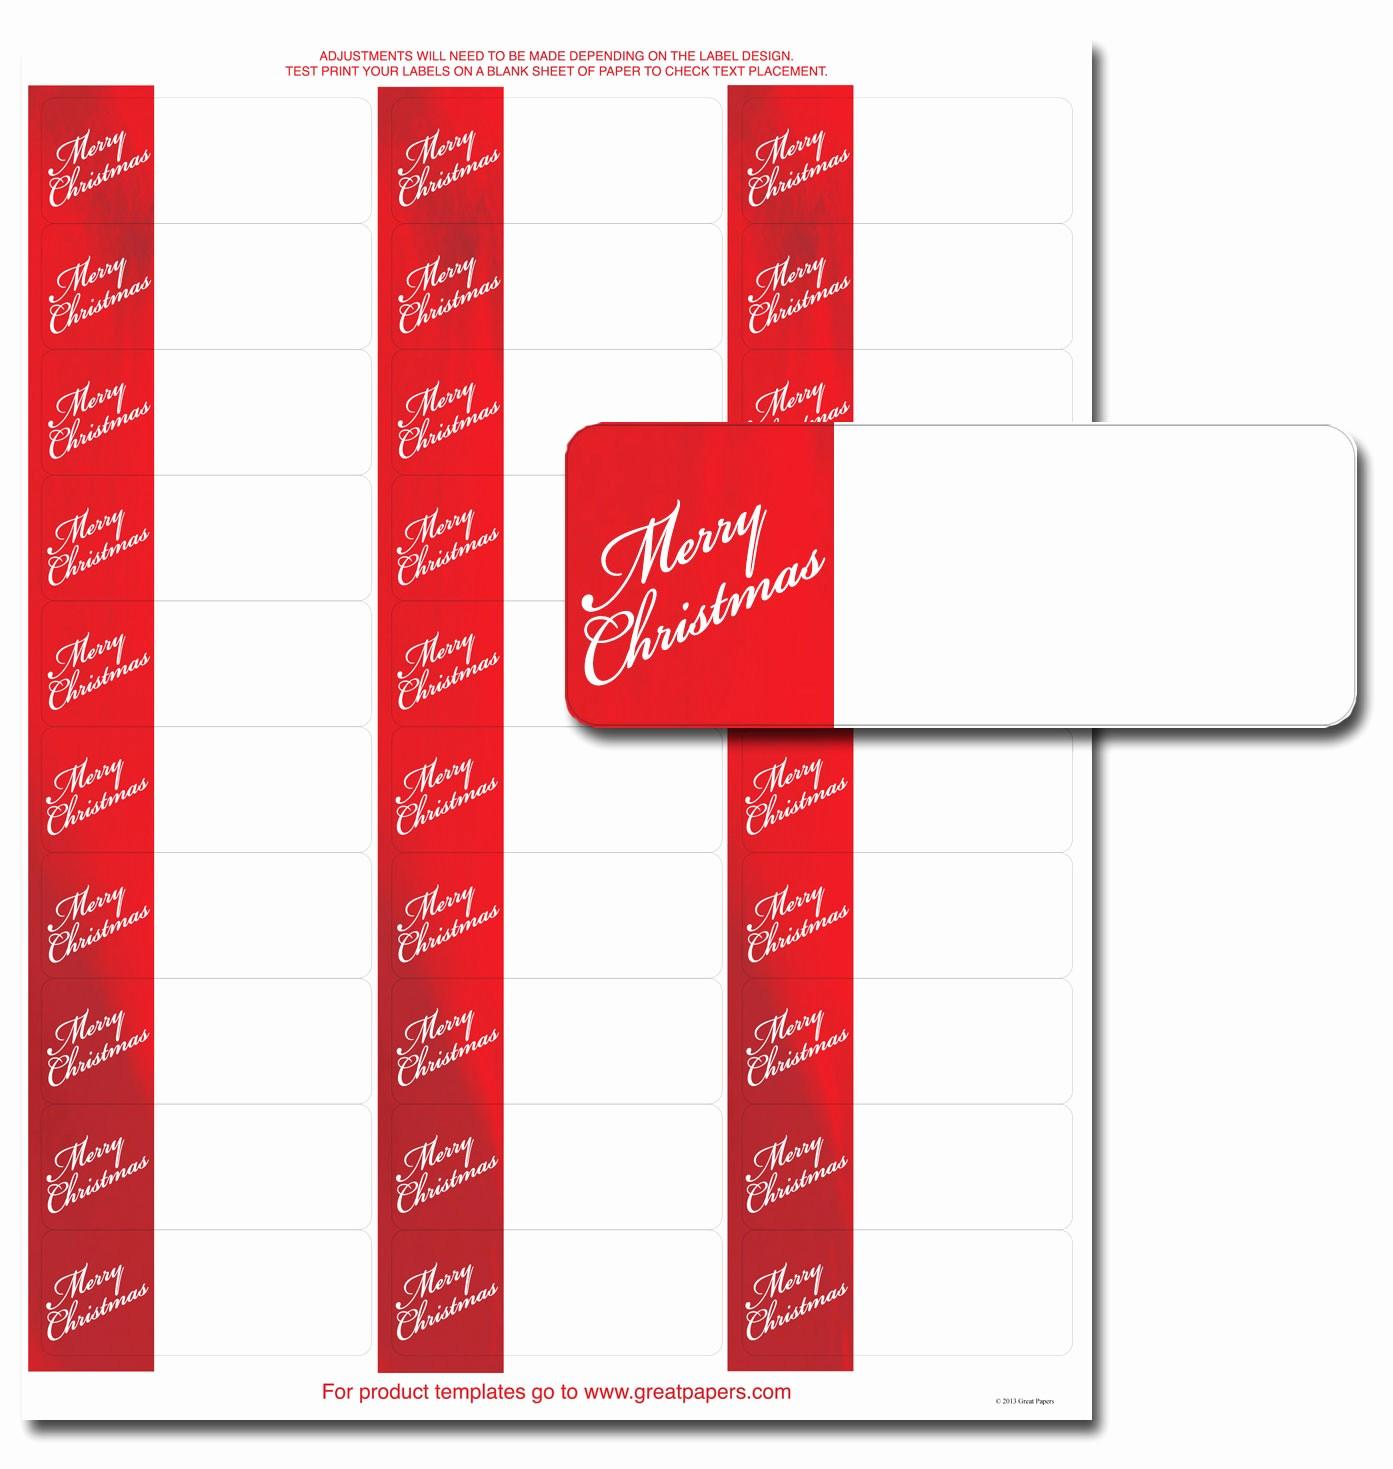 Label Templates 30 Per Page Fresh Free Christmas Return Address Label Templates 30 Per Sheet